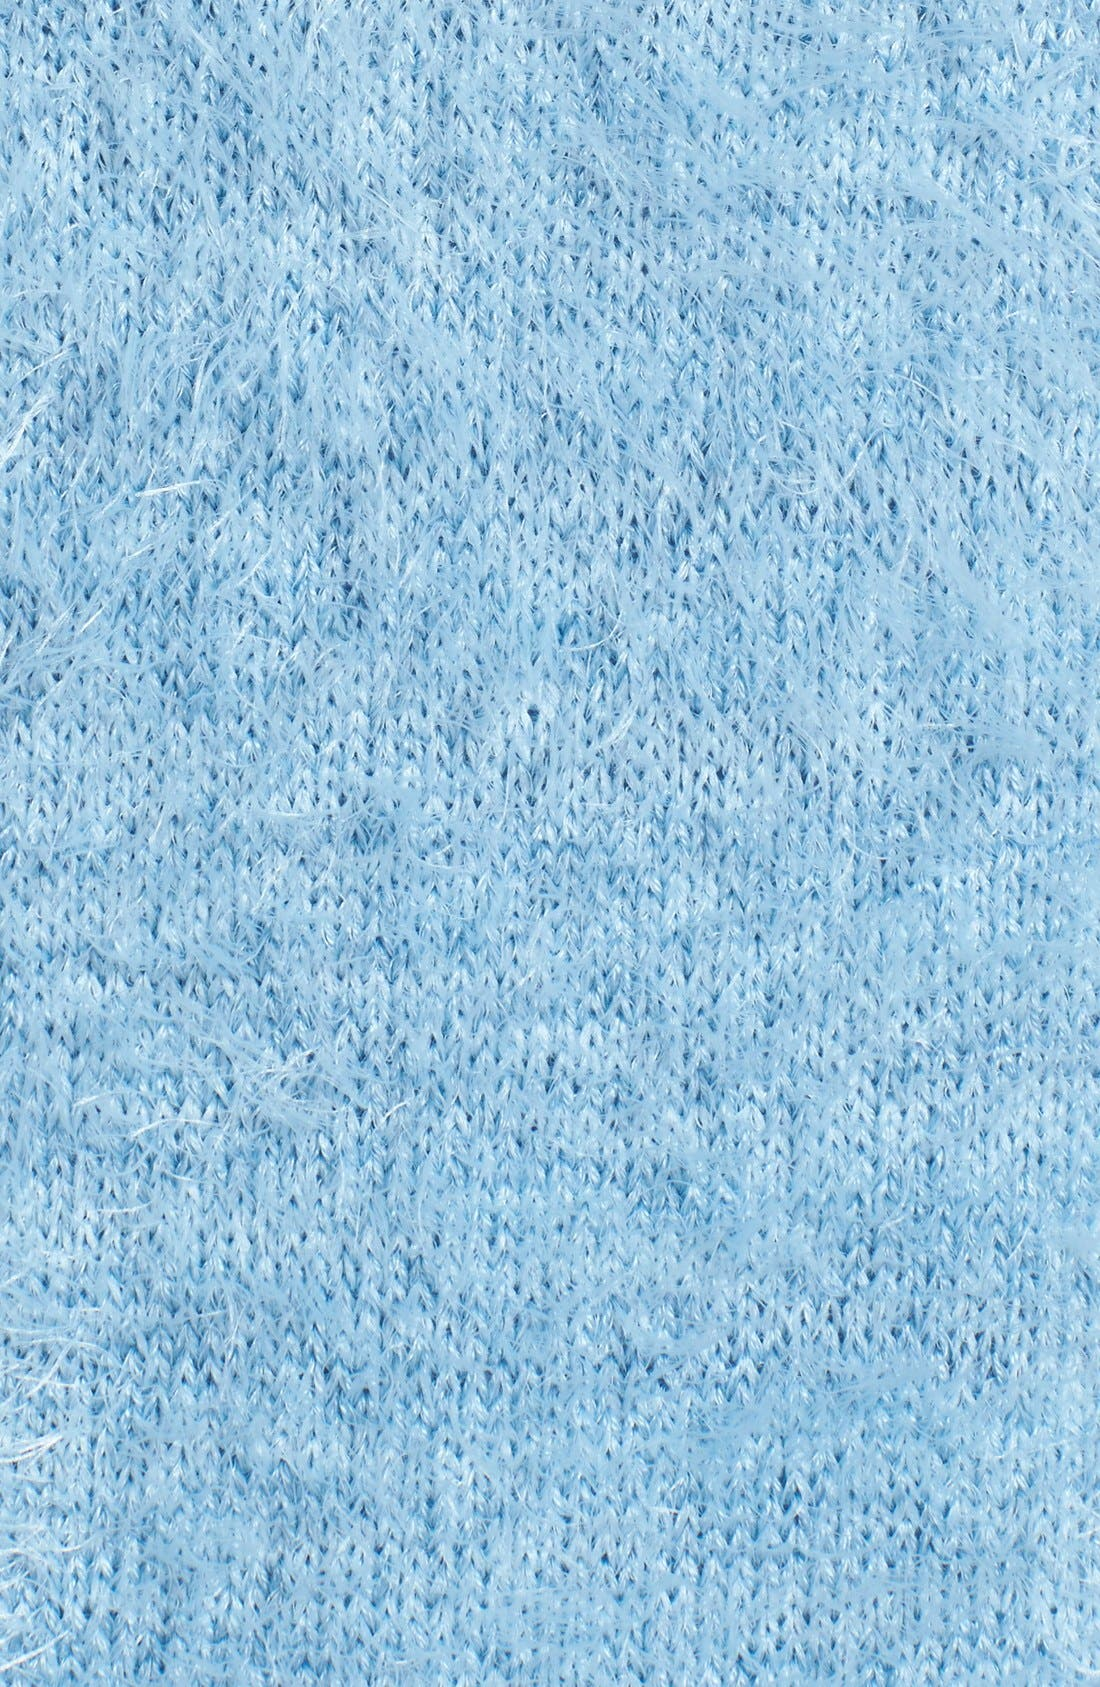 Alternate Image 3  - Vince Camuto Eyelash Knit Sweater (Petite)